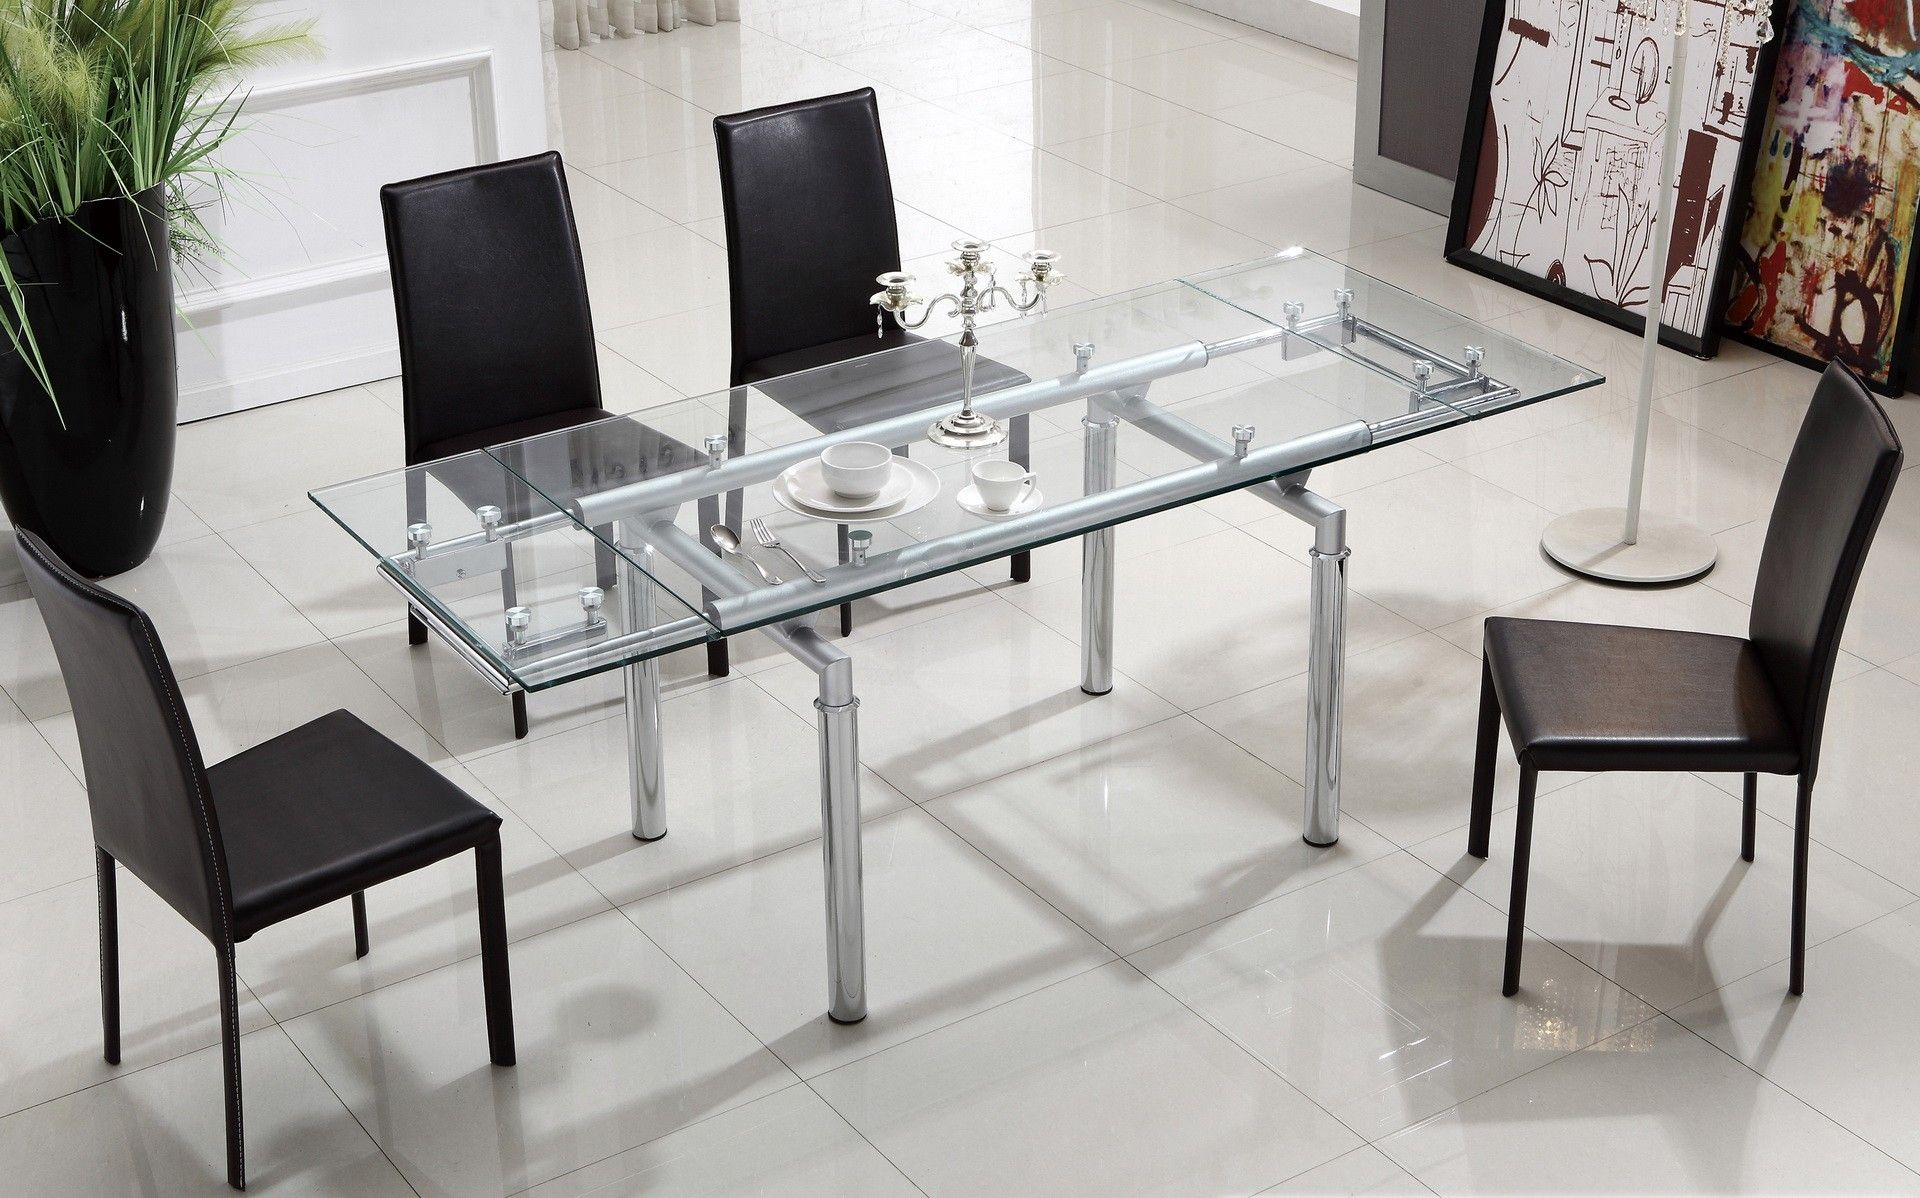 AtHome DT103 + DC222 Diningroom Set - Enjoy your home living space ...